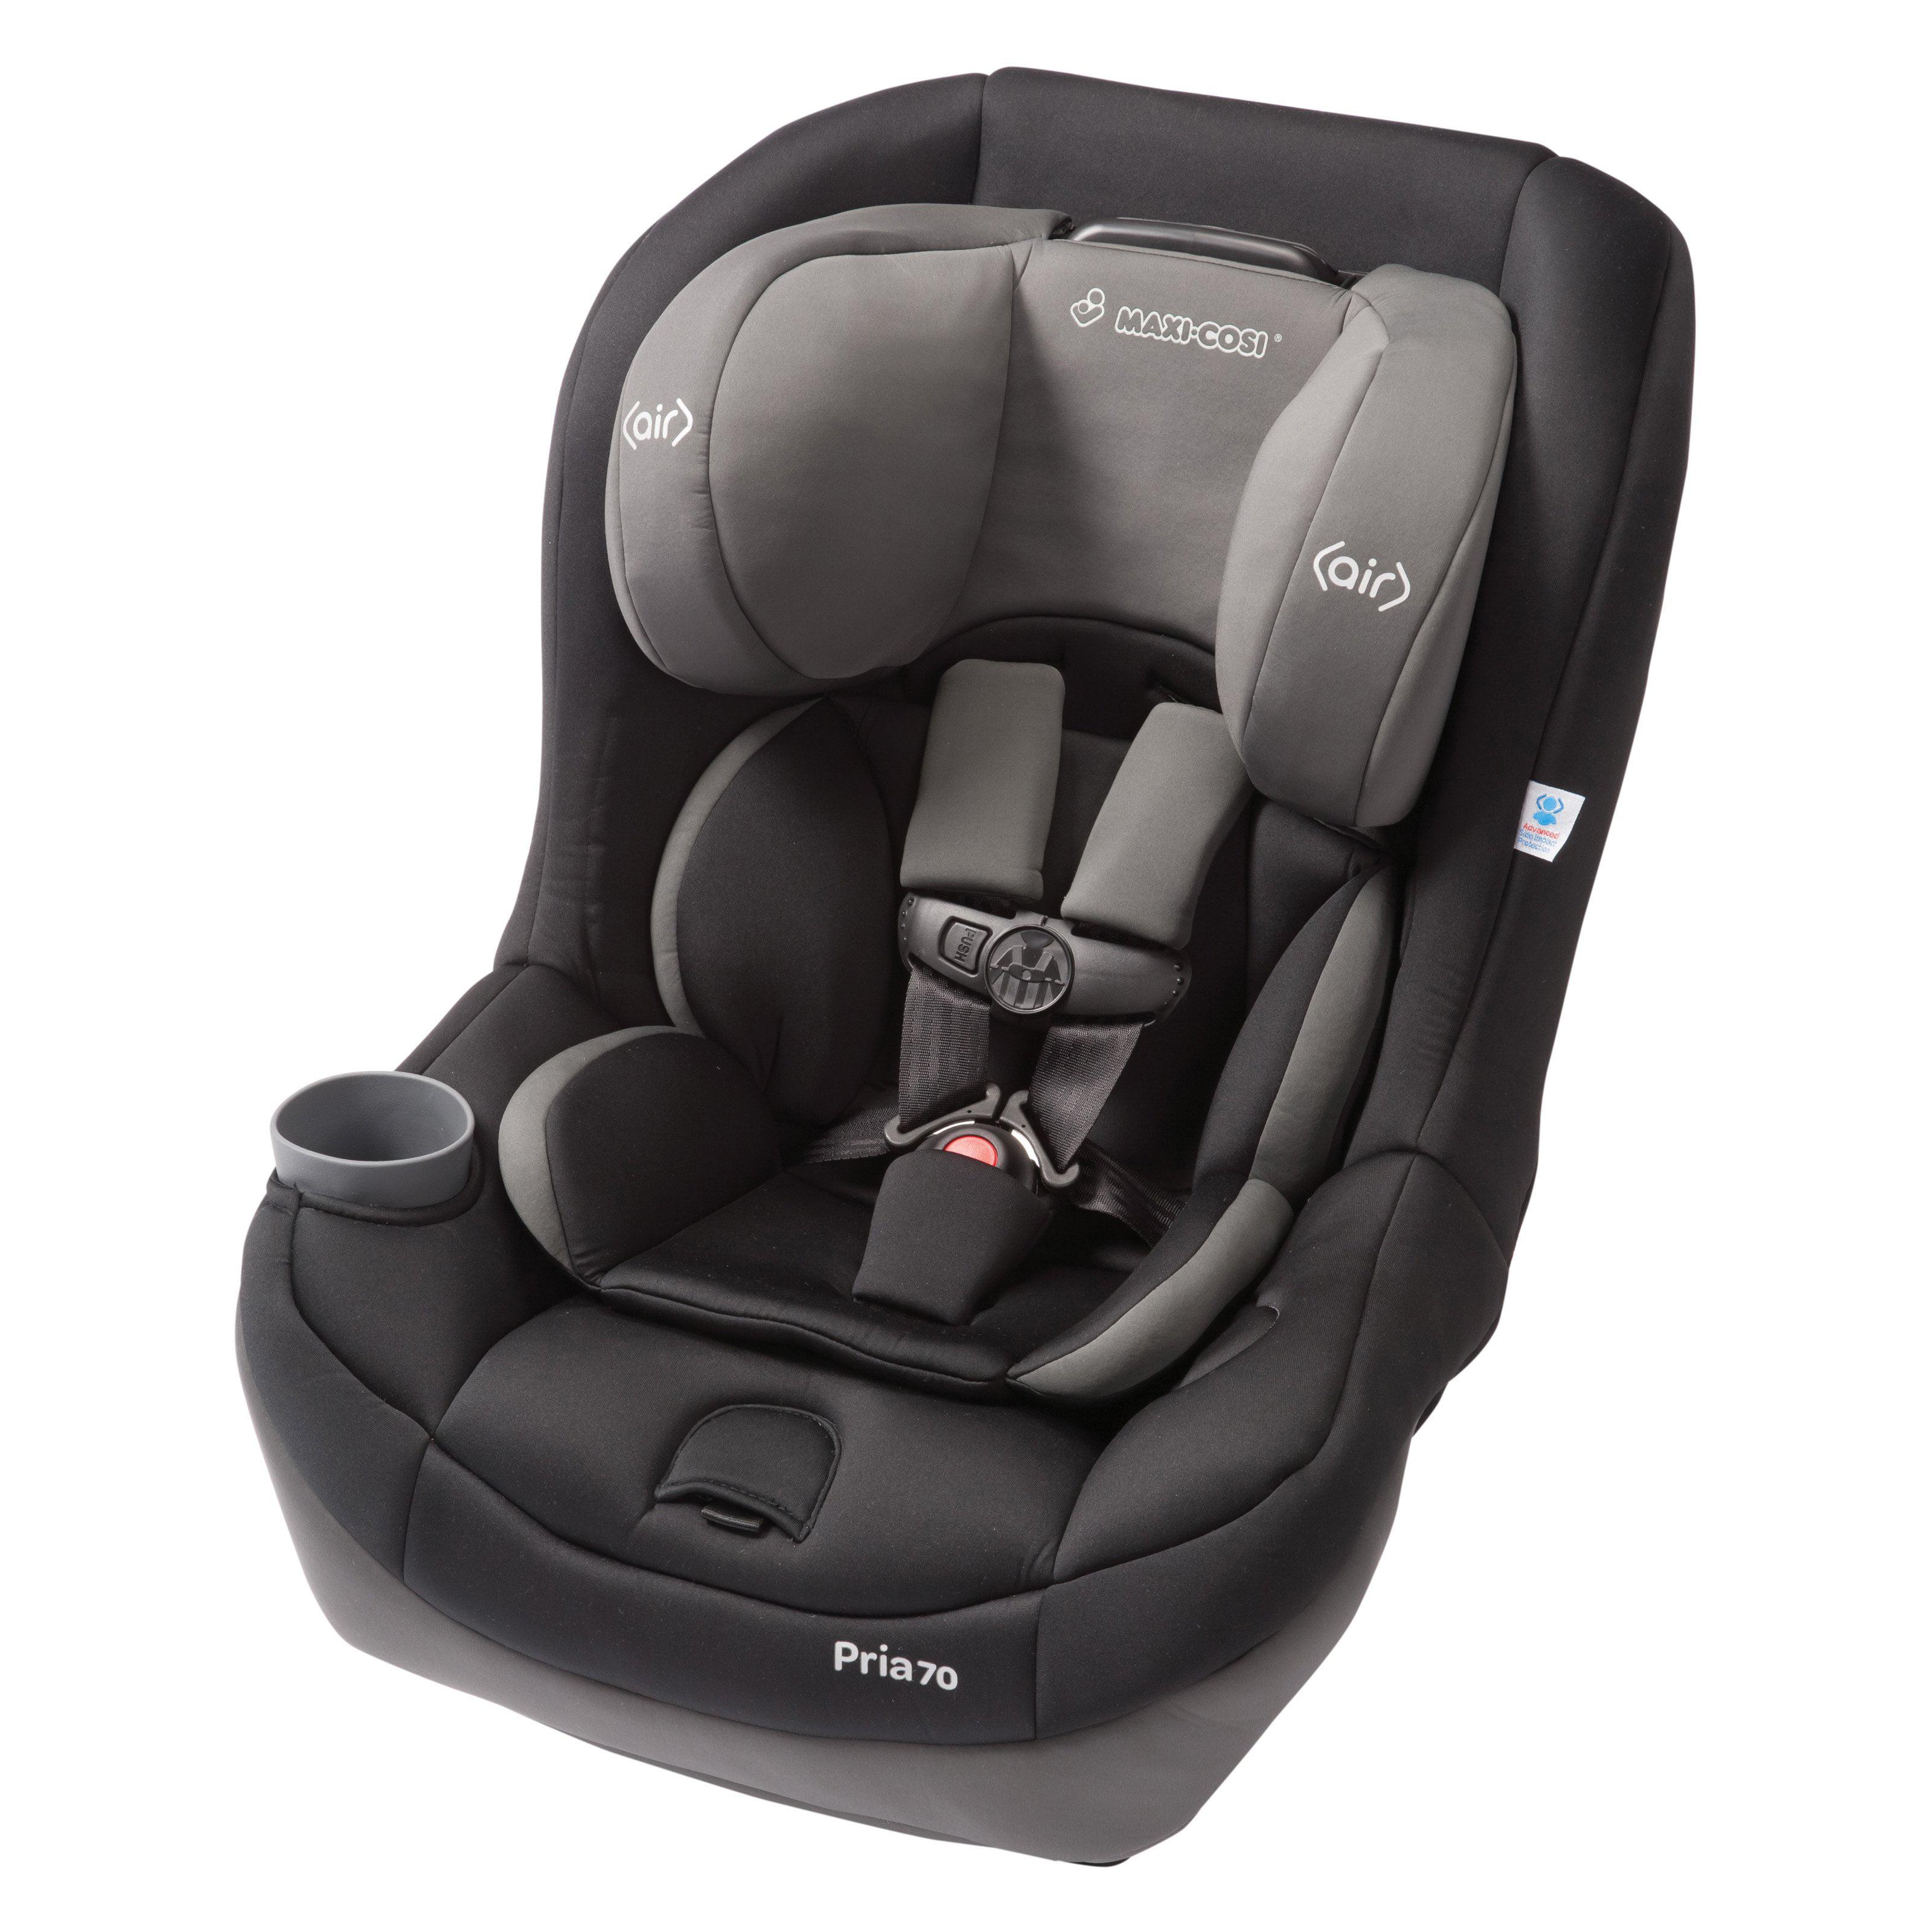 Maxi-Cosi Pria 70 Convertible Car Seat-Total Black